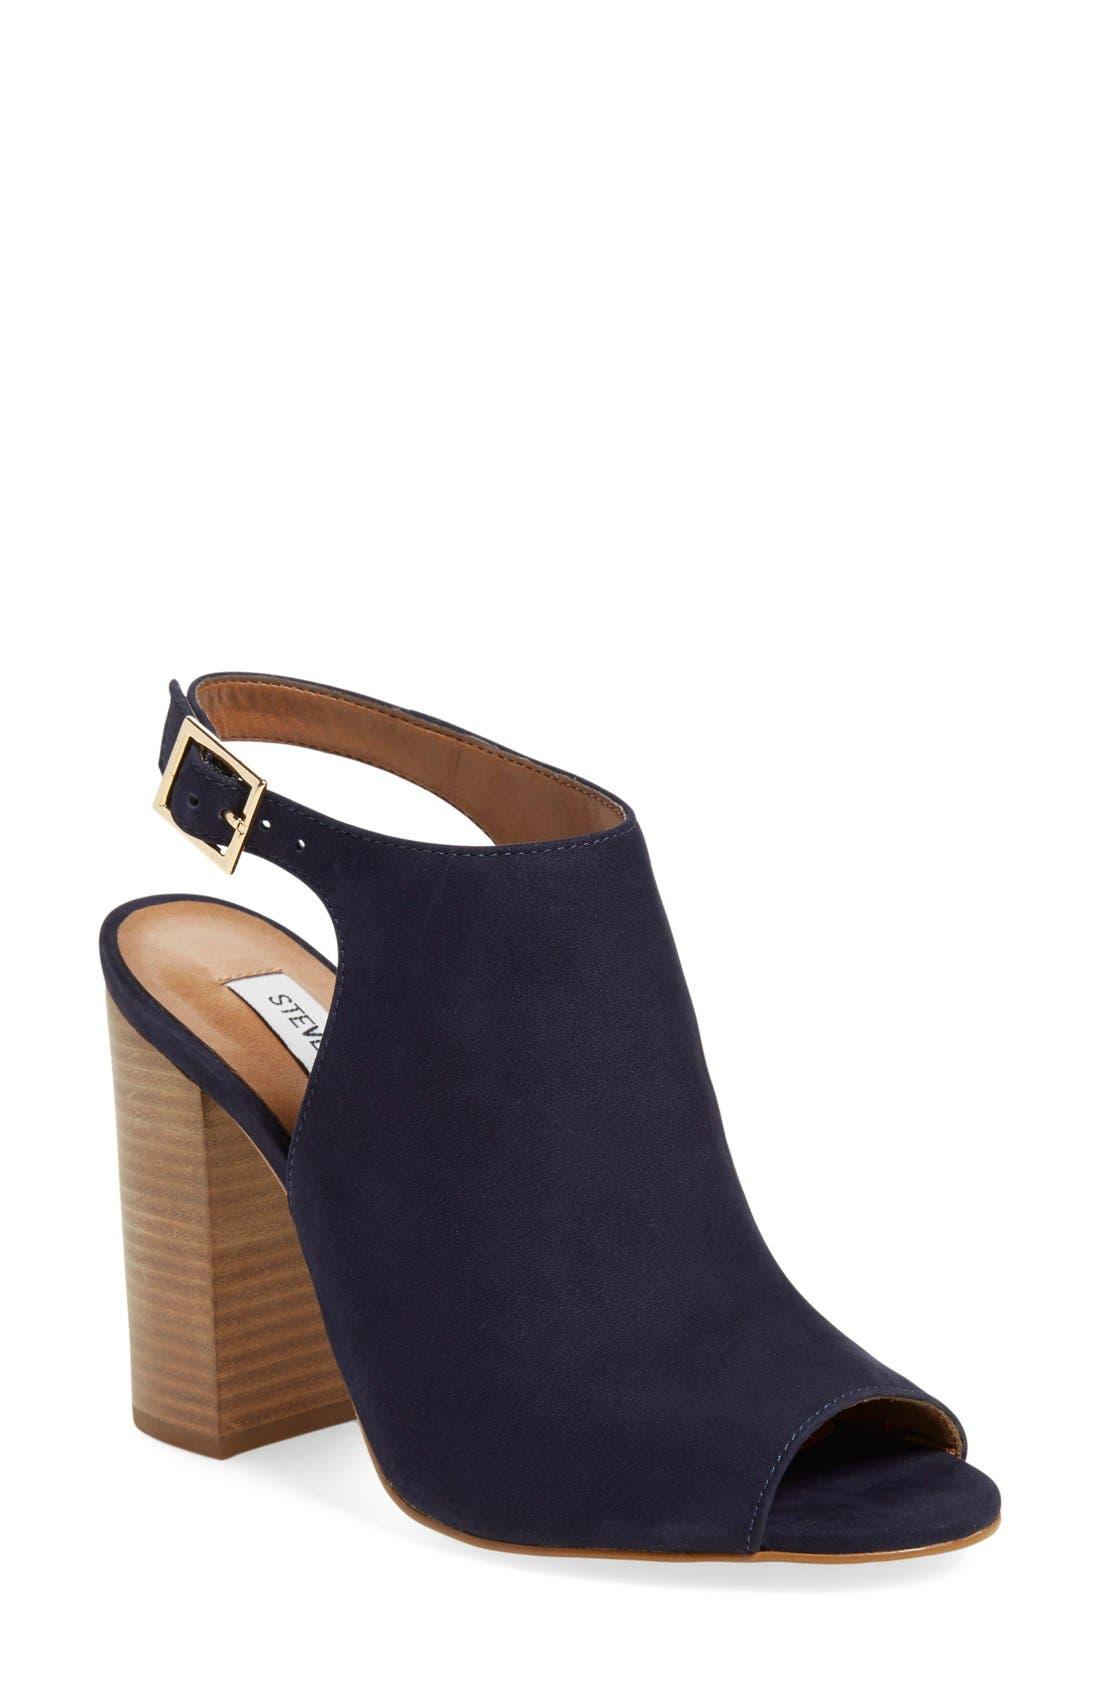 Main Image - Steve Madden 'Claara' Block Heel Sandal (Women)